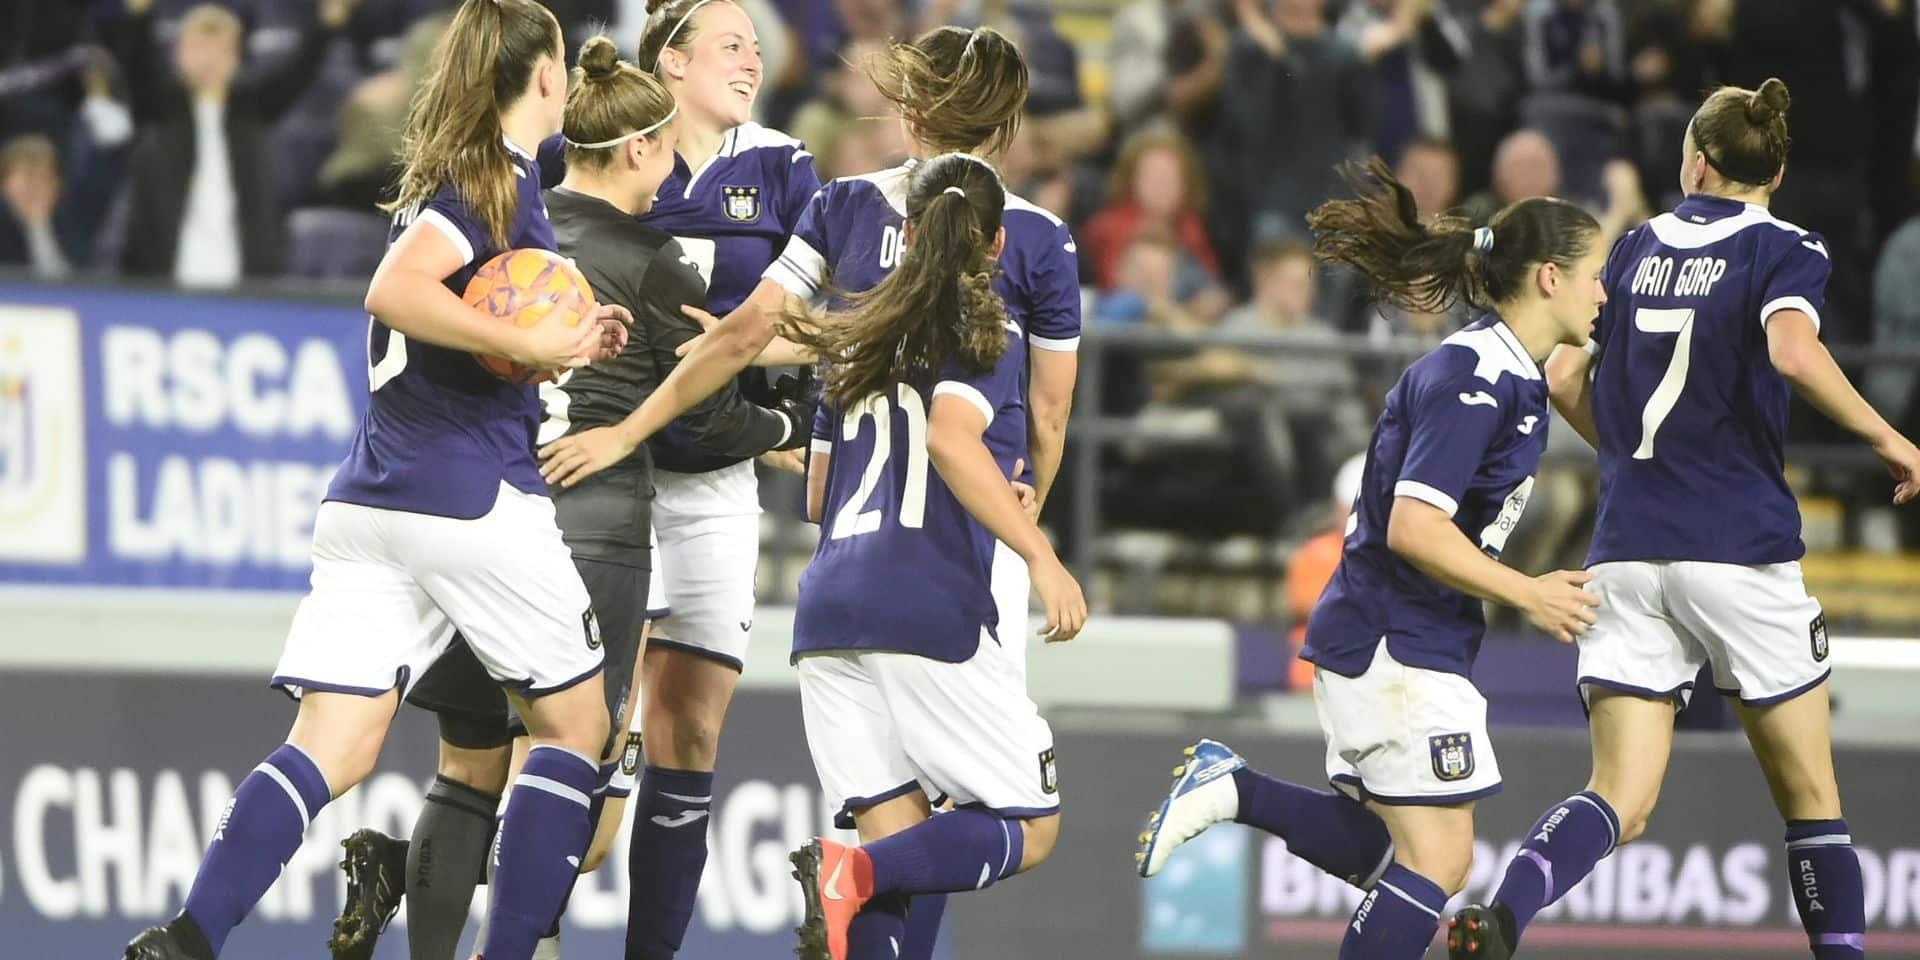 Vers un élargissement du championnat de Belgique de football féminin ?